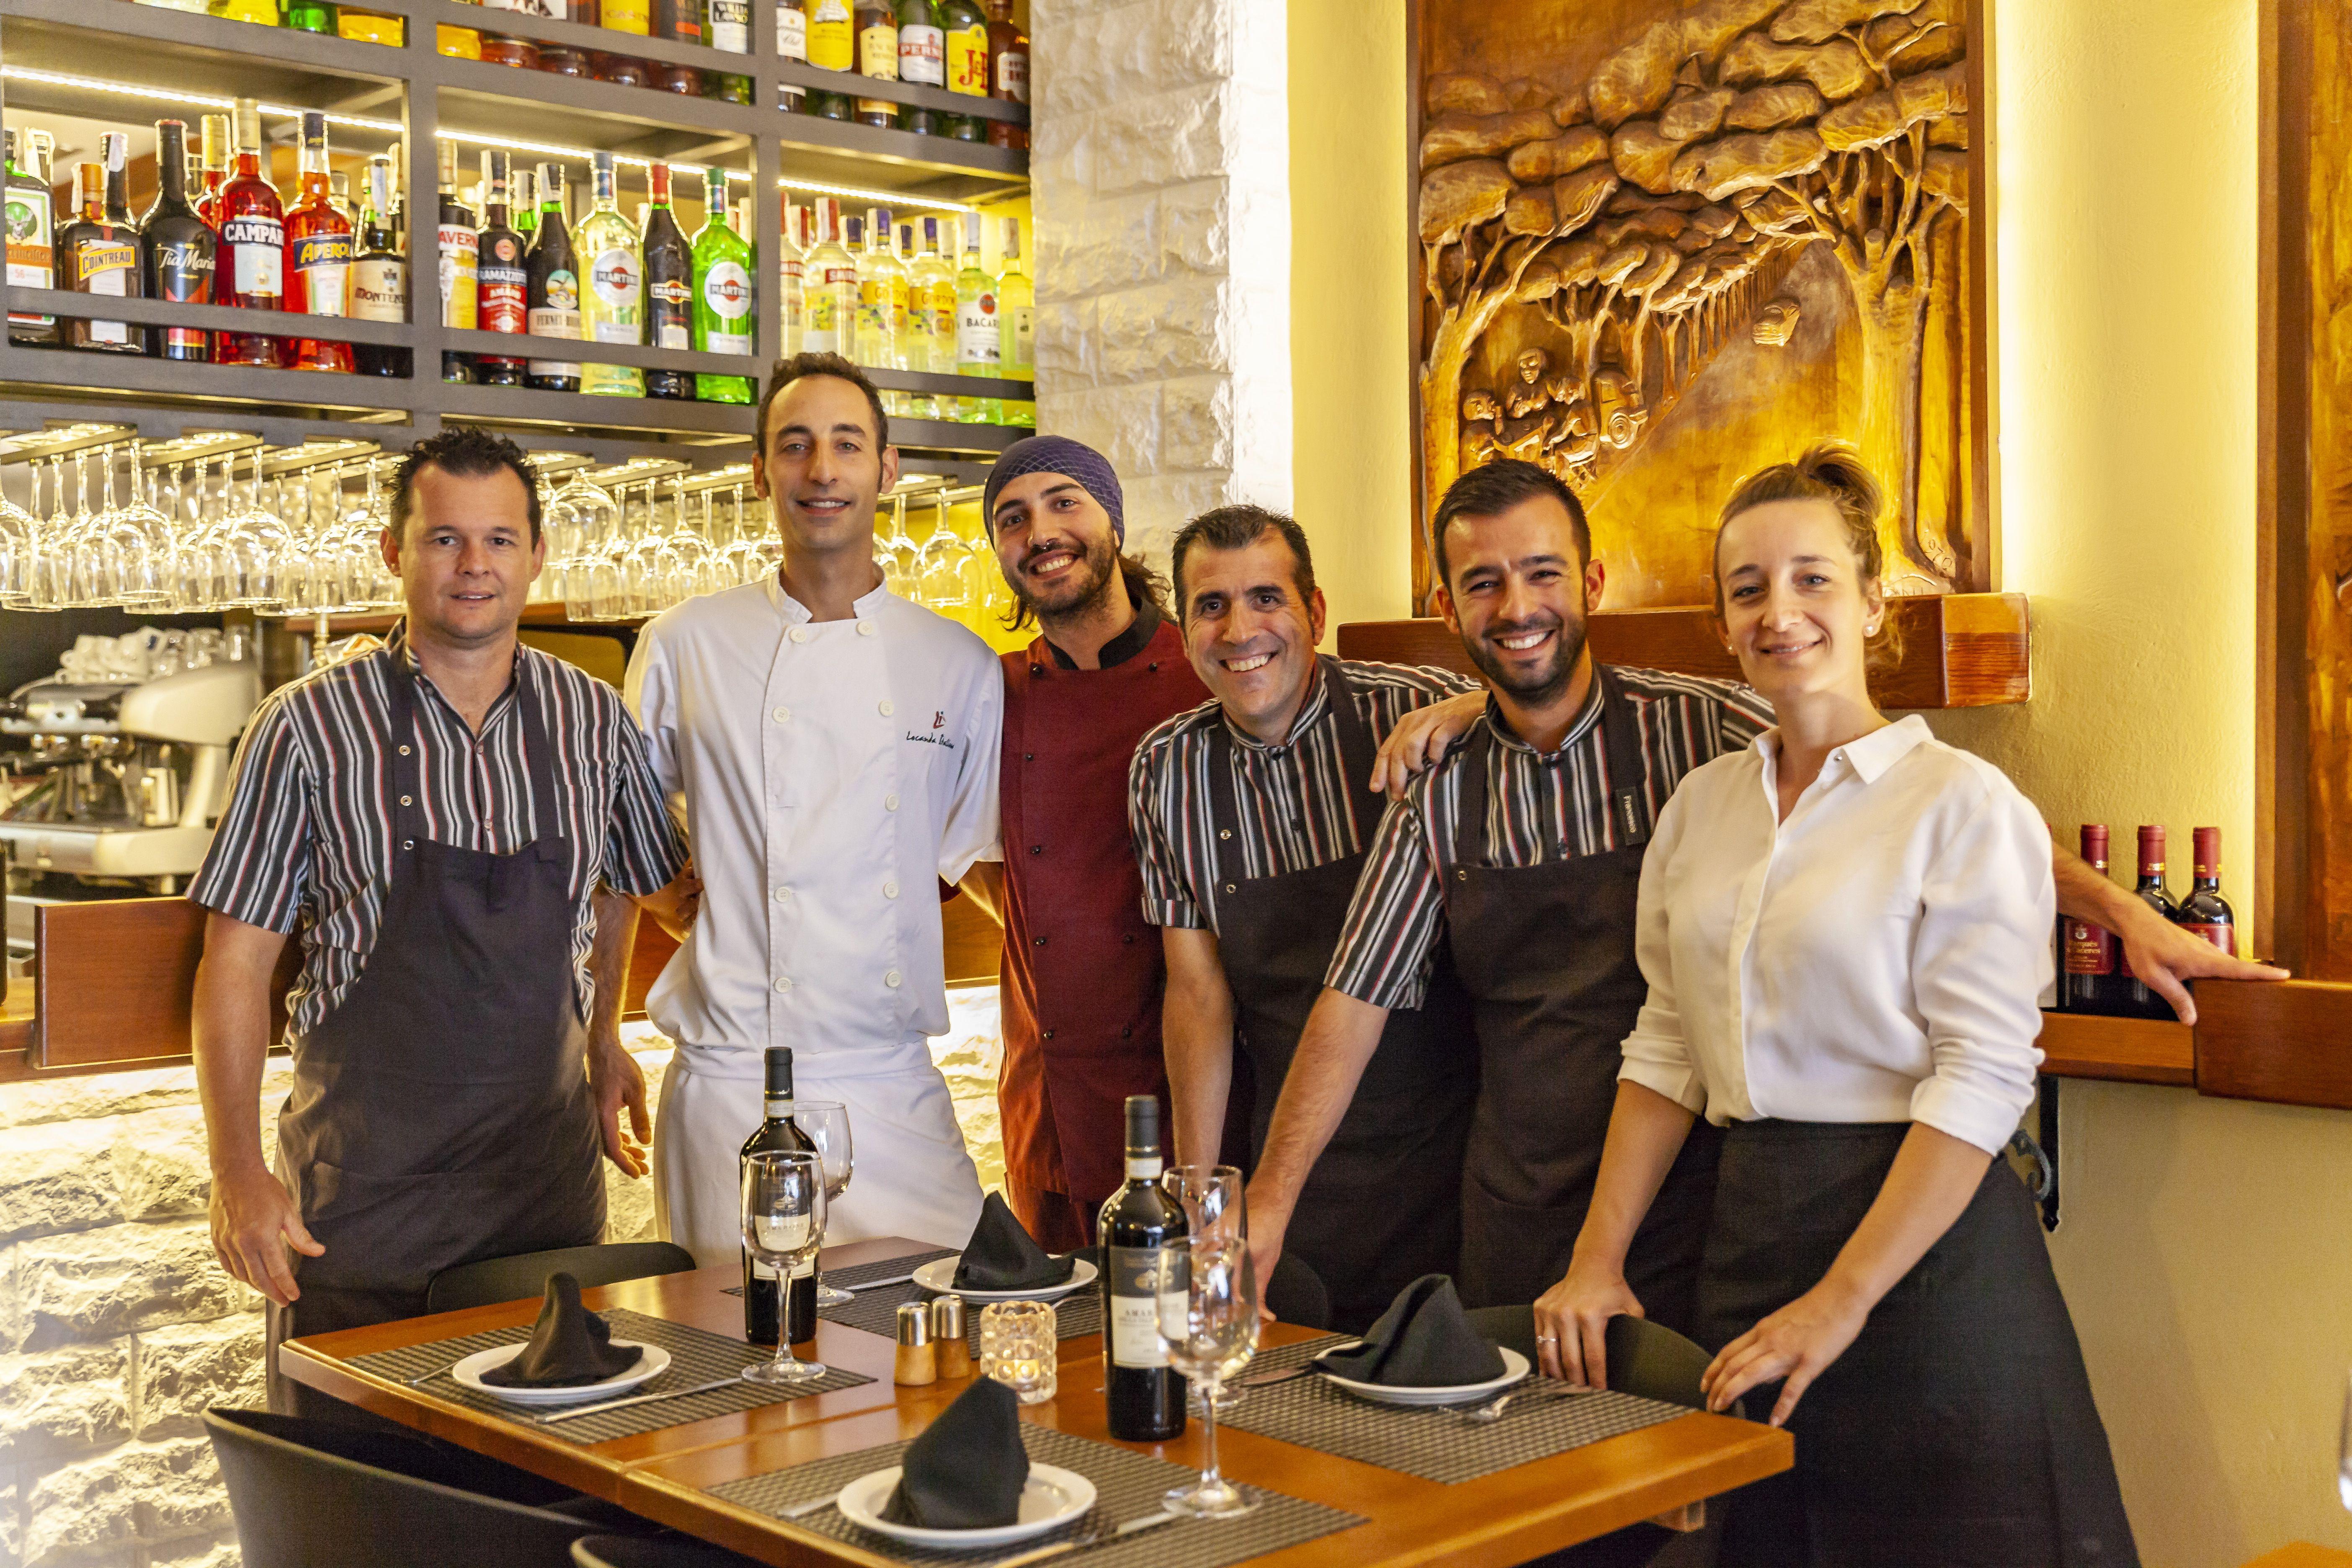 Foto 25 de Restaurante en Arona | Restaurante Locanda Italiana